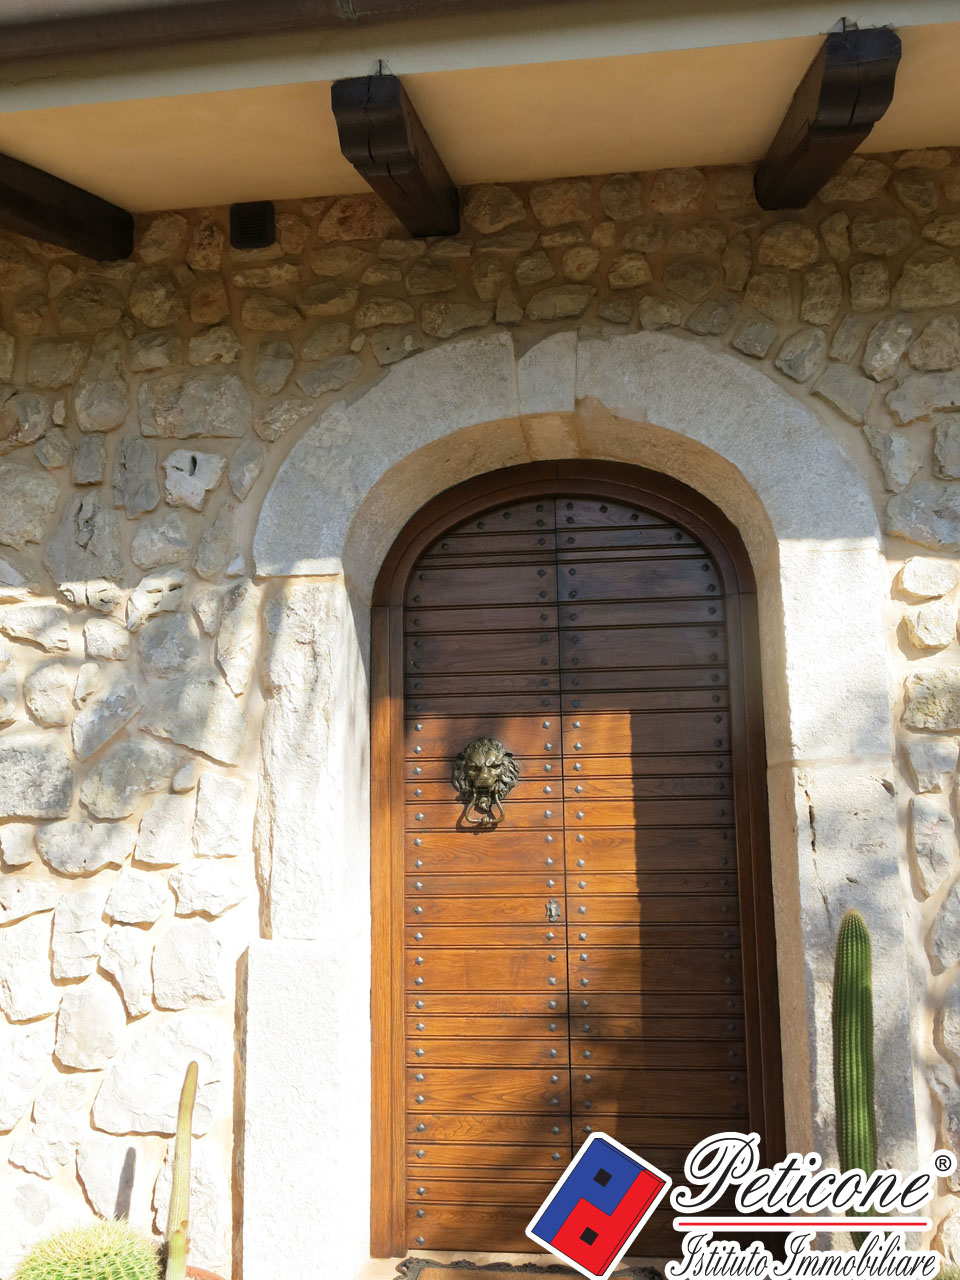 Villa in Vendita a Fondi: 3 locali, 107 mq - Foto 18